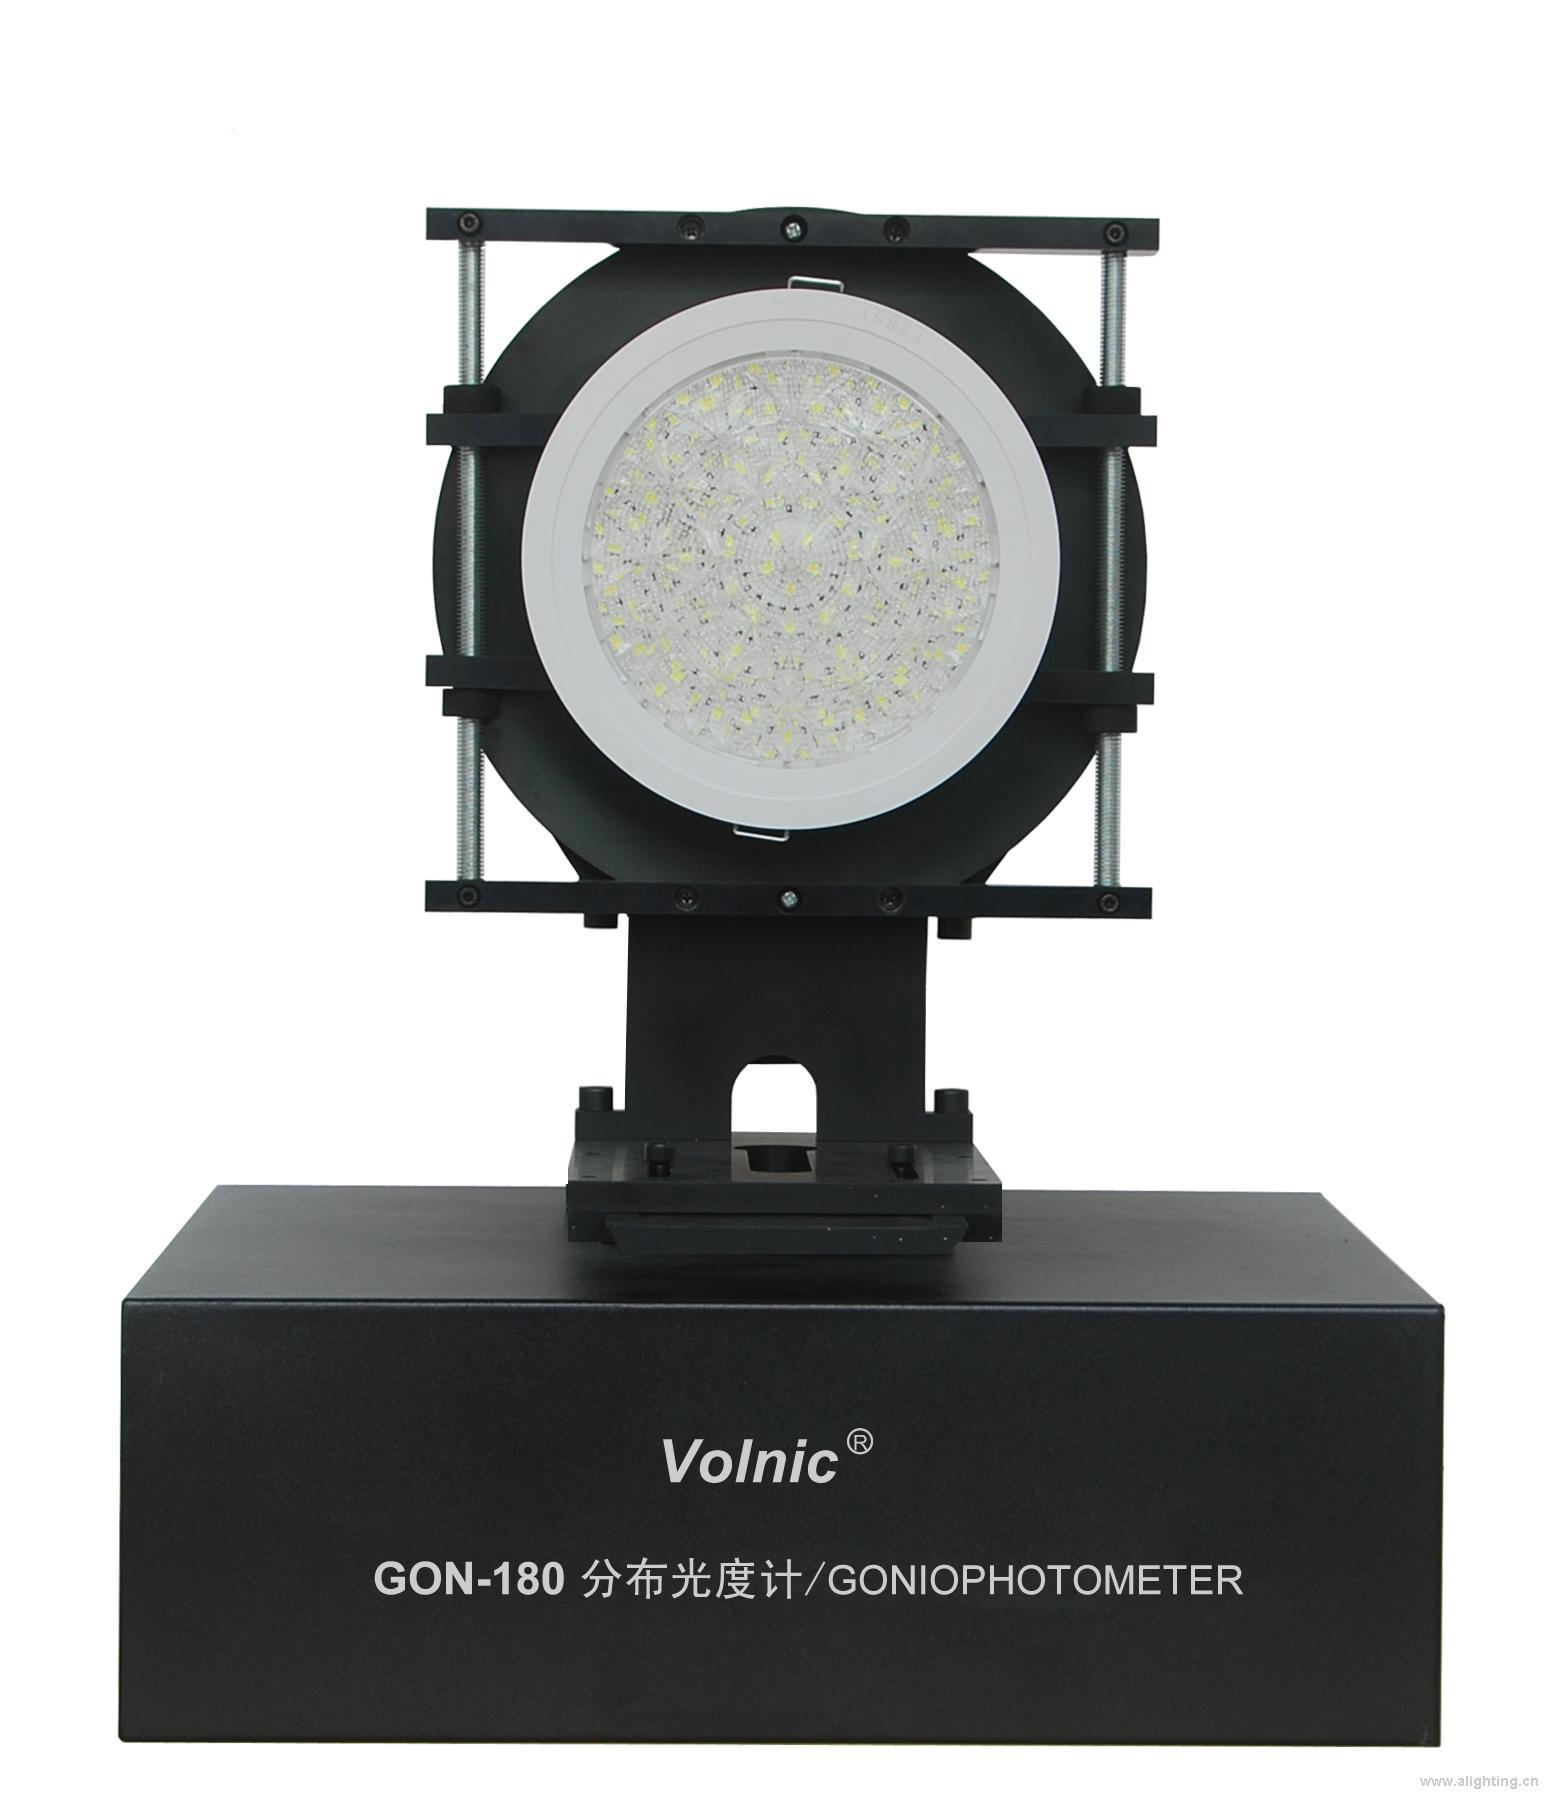 GON-180 LED 小型灯具分布光度计